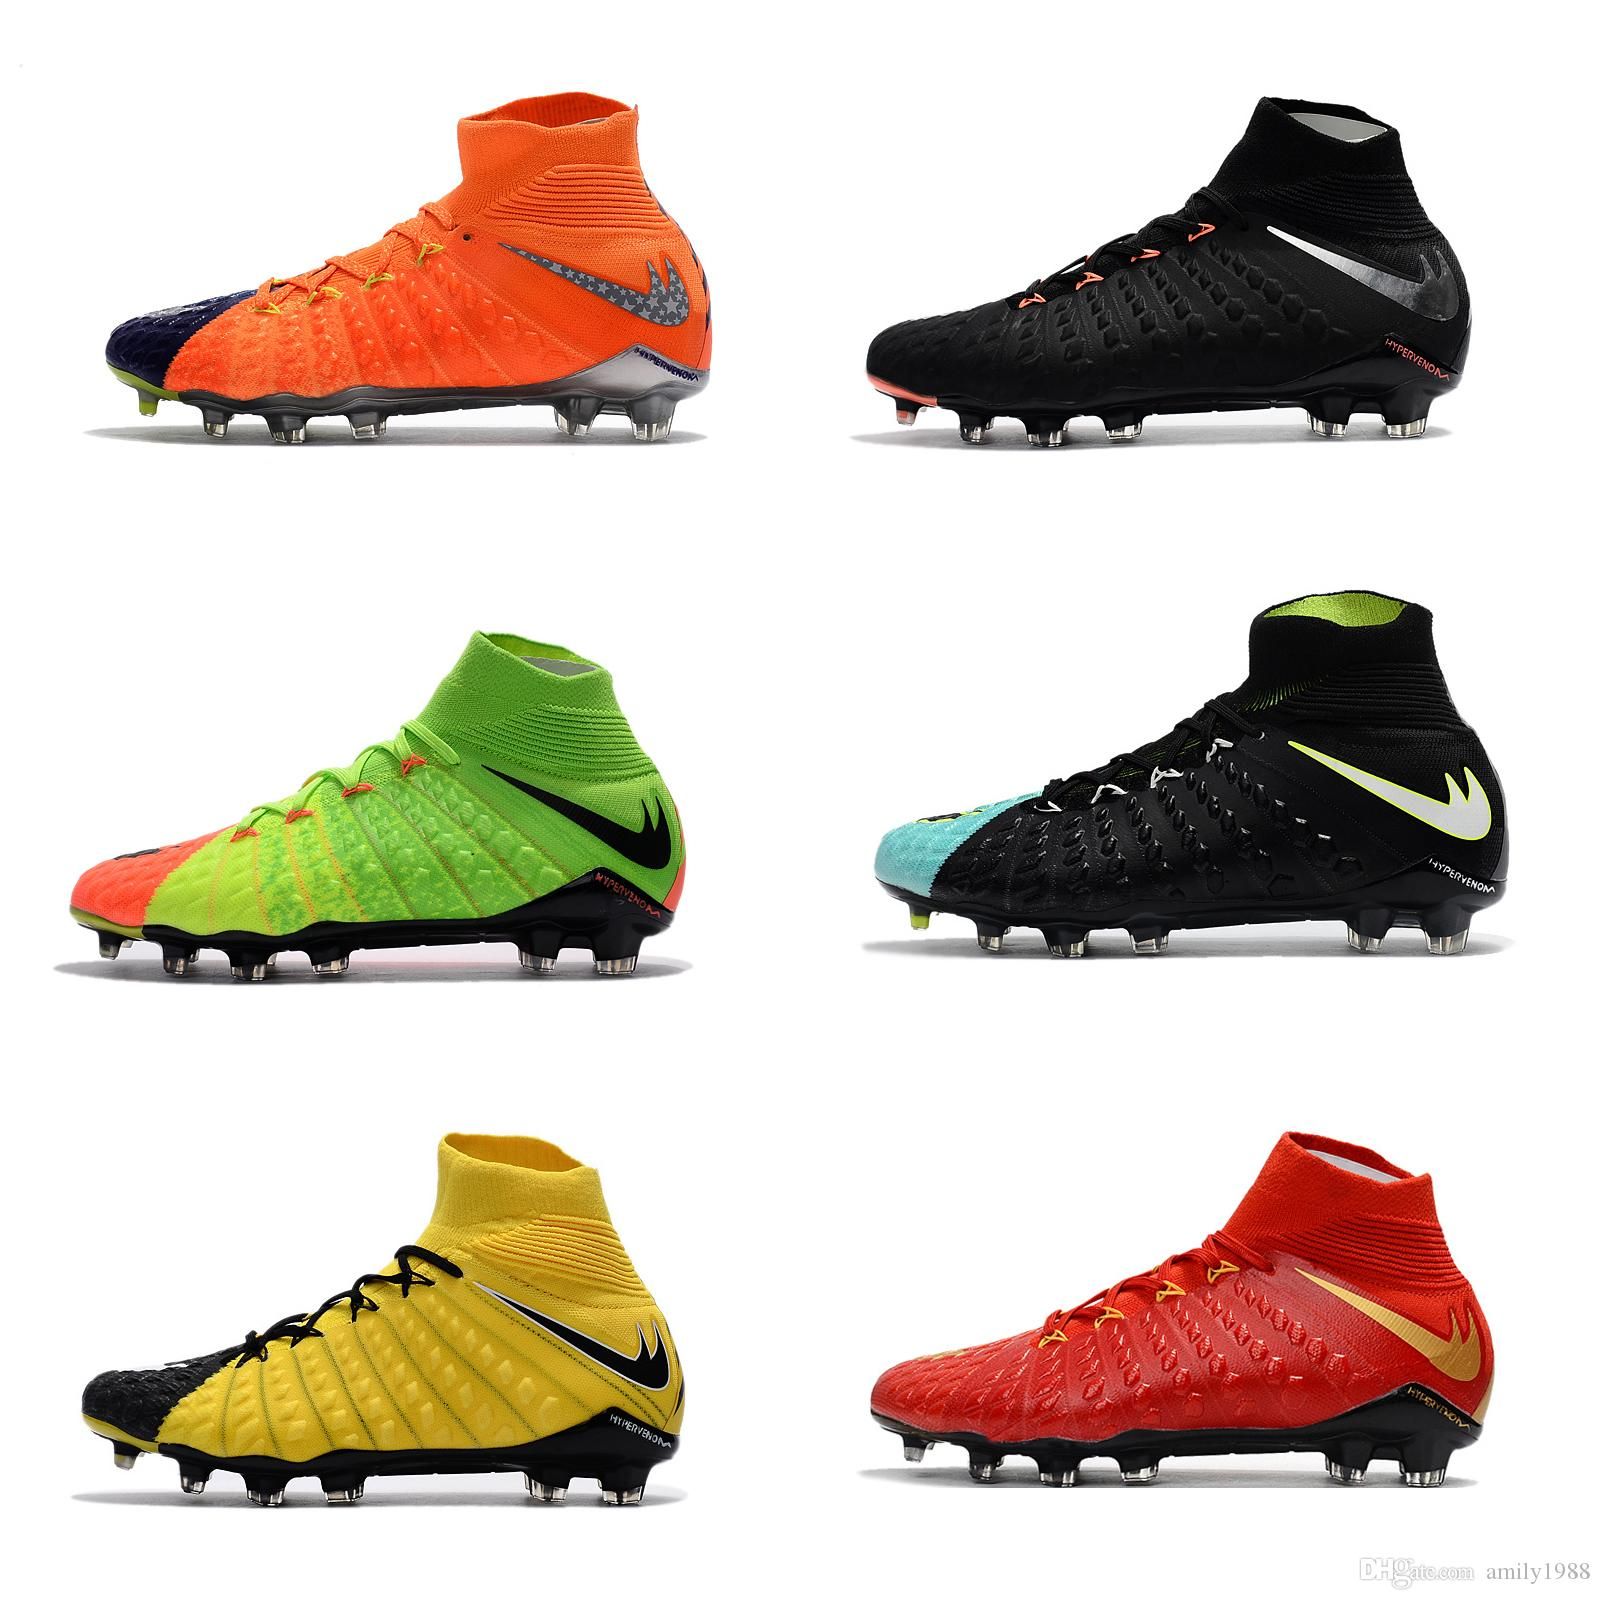 buy popular f1970 67424 2017 High Top Hypervenom Phantom III DF FG Men s Soccer Shoe boots Free  Shipping Cheap Mens Hypervenom 3 soccer cleats football shoes sale